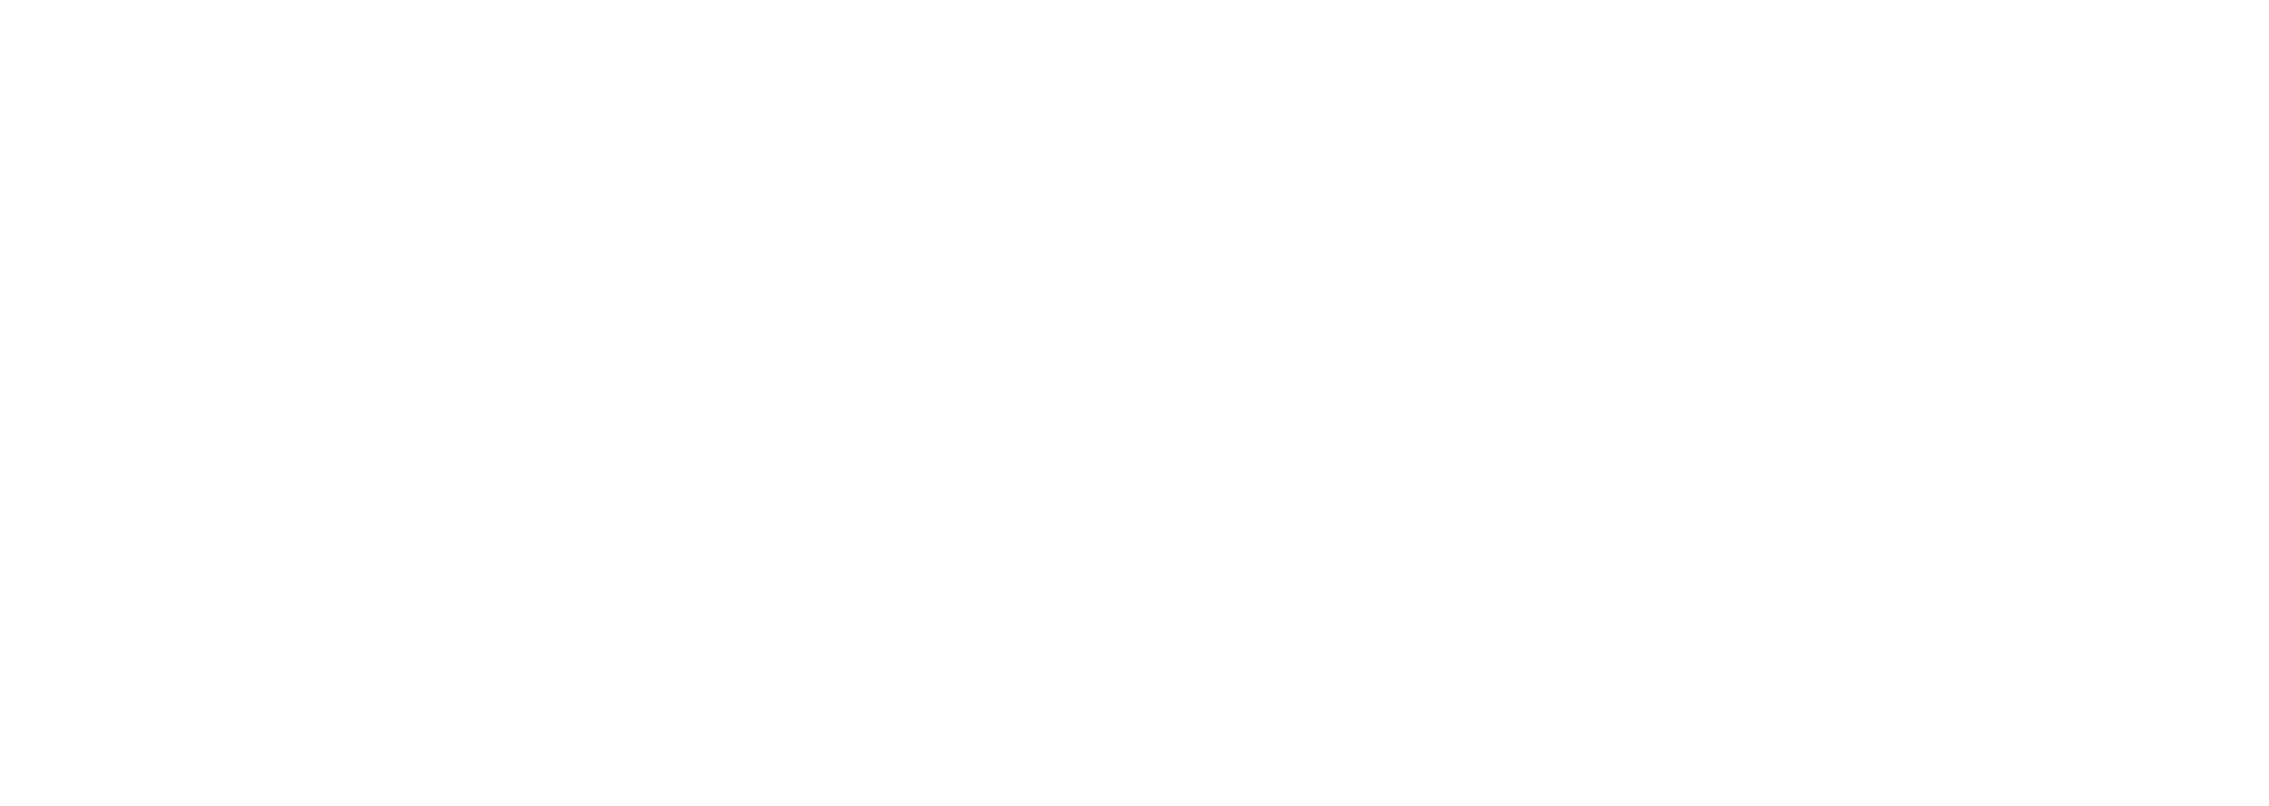 gruenderzentrum-ruhr-lukas-neweling-lionel-benny-wh